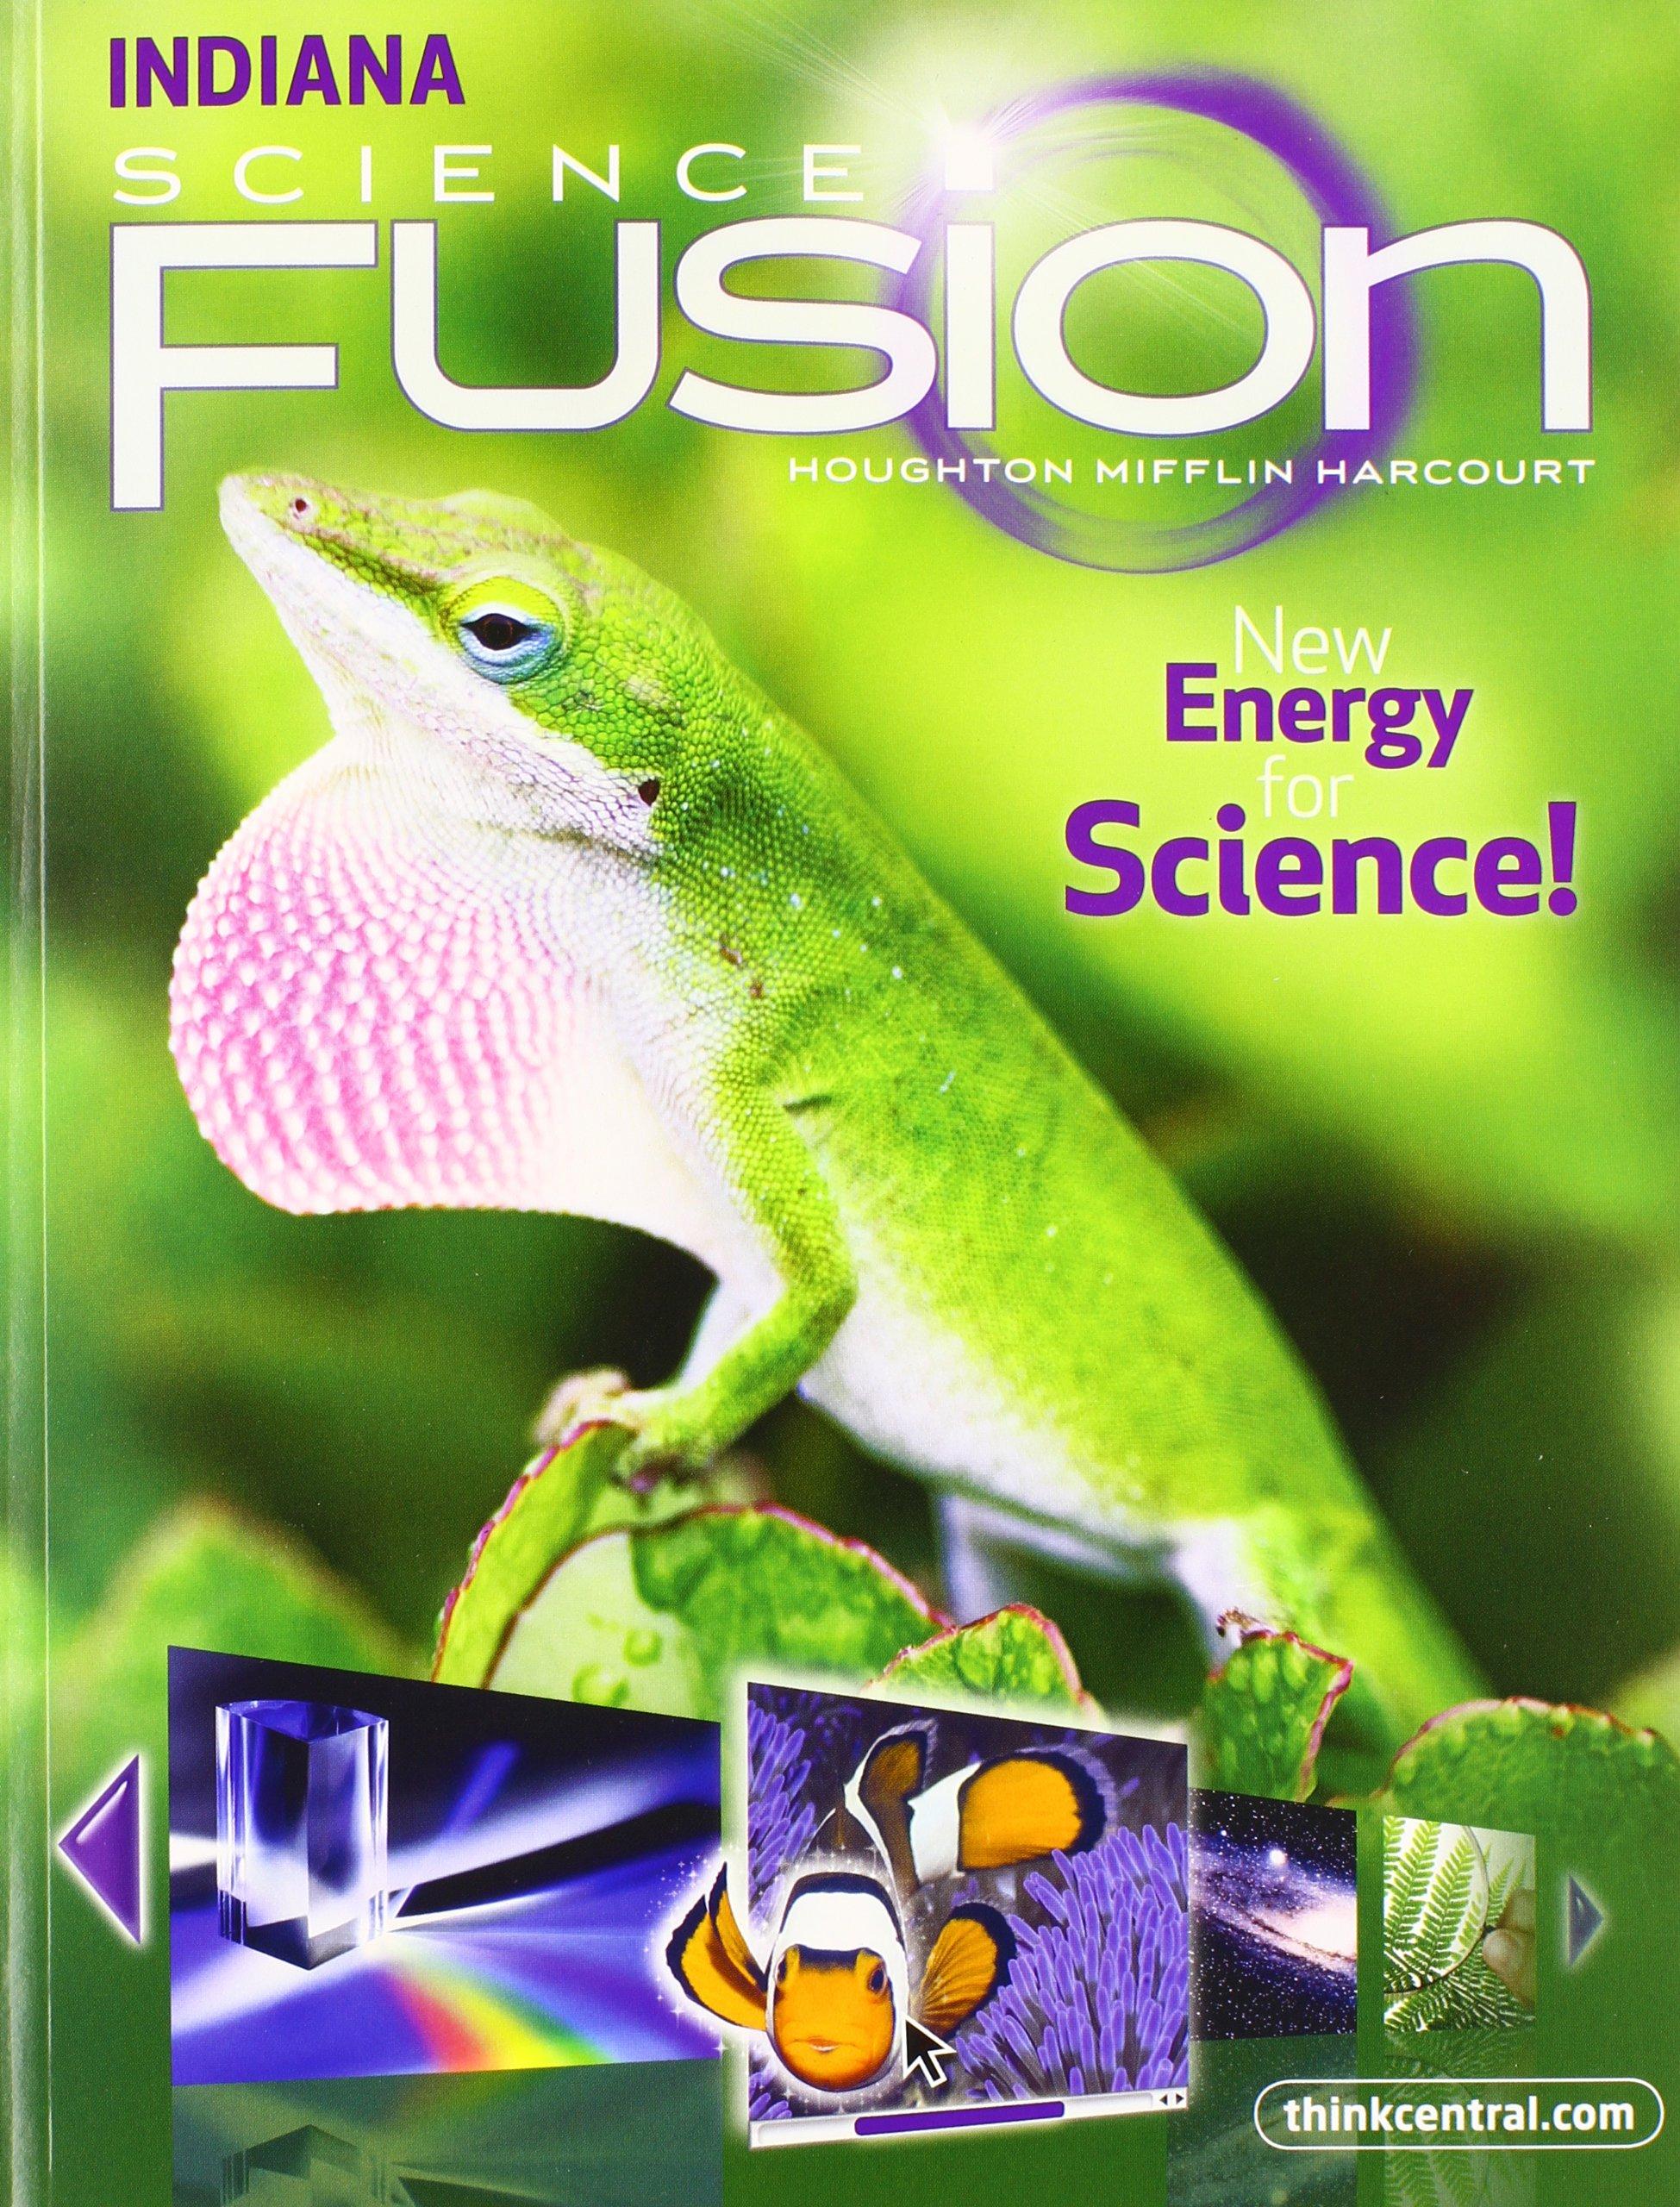 Houghton Mifflin Harcourt Science Fusion: Student Edition Interactive Worktext Grade 3 2012 ebook